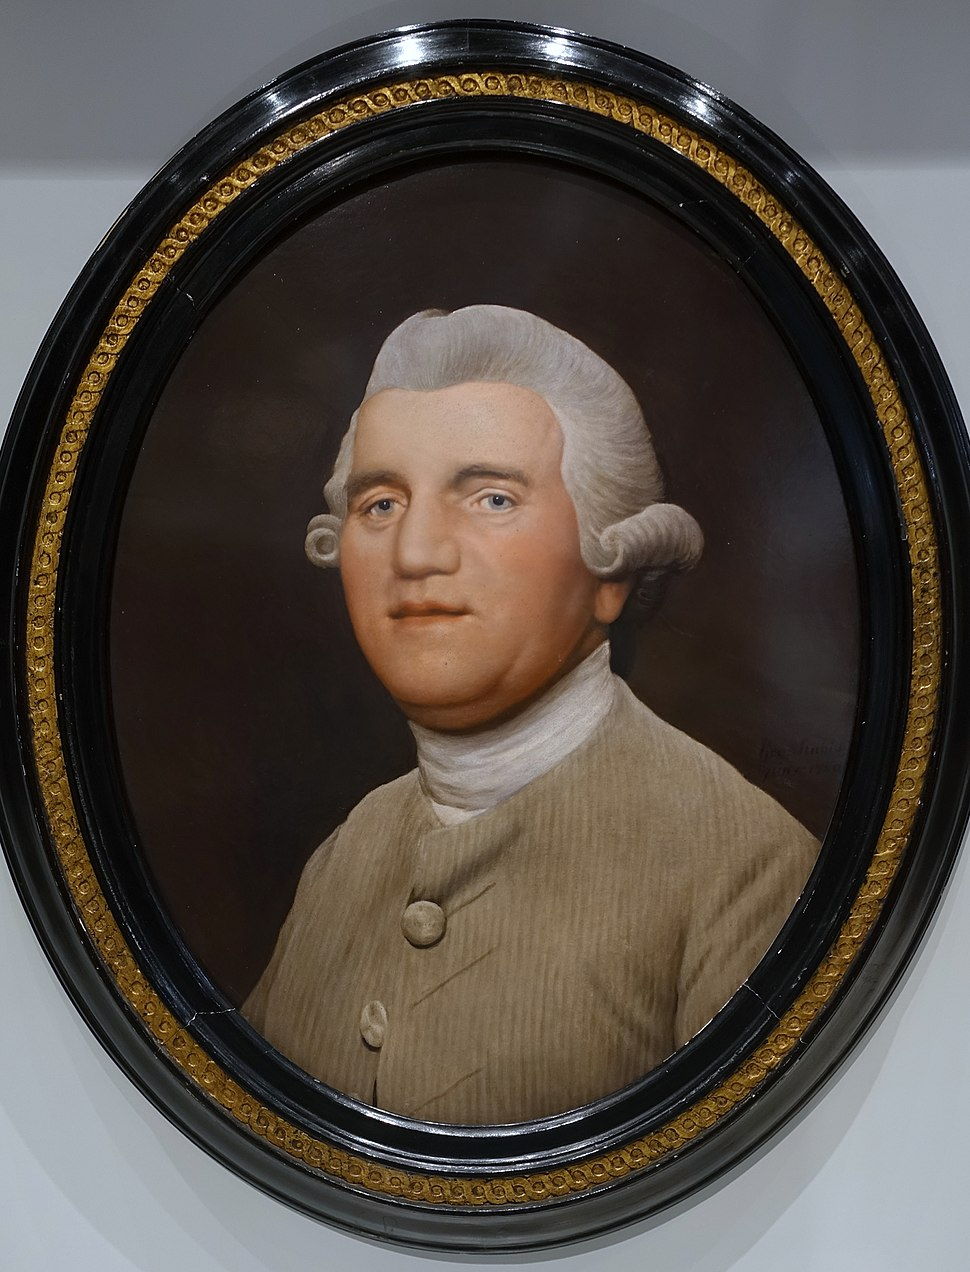 Josiah Wedgwood by George Stubbs, 1780, enamel on a Wedgwood ceramic tablet - Wedgwood Museum - Barlaston, Stoke-on-Trent, England - DSC09537